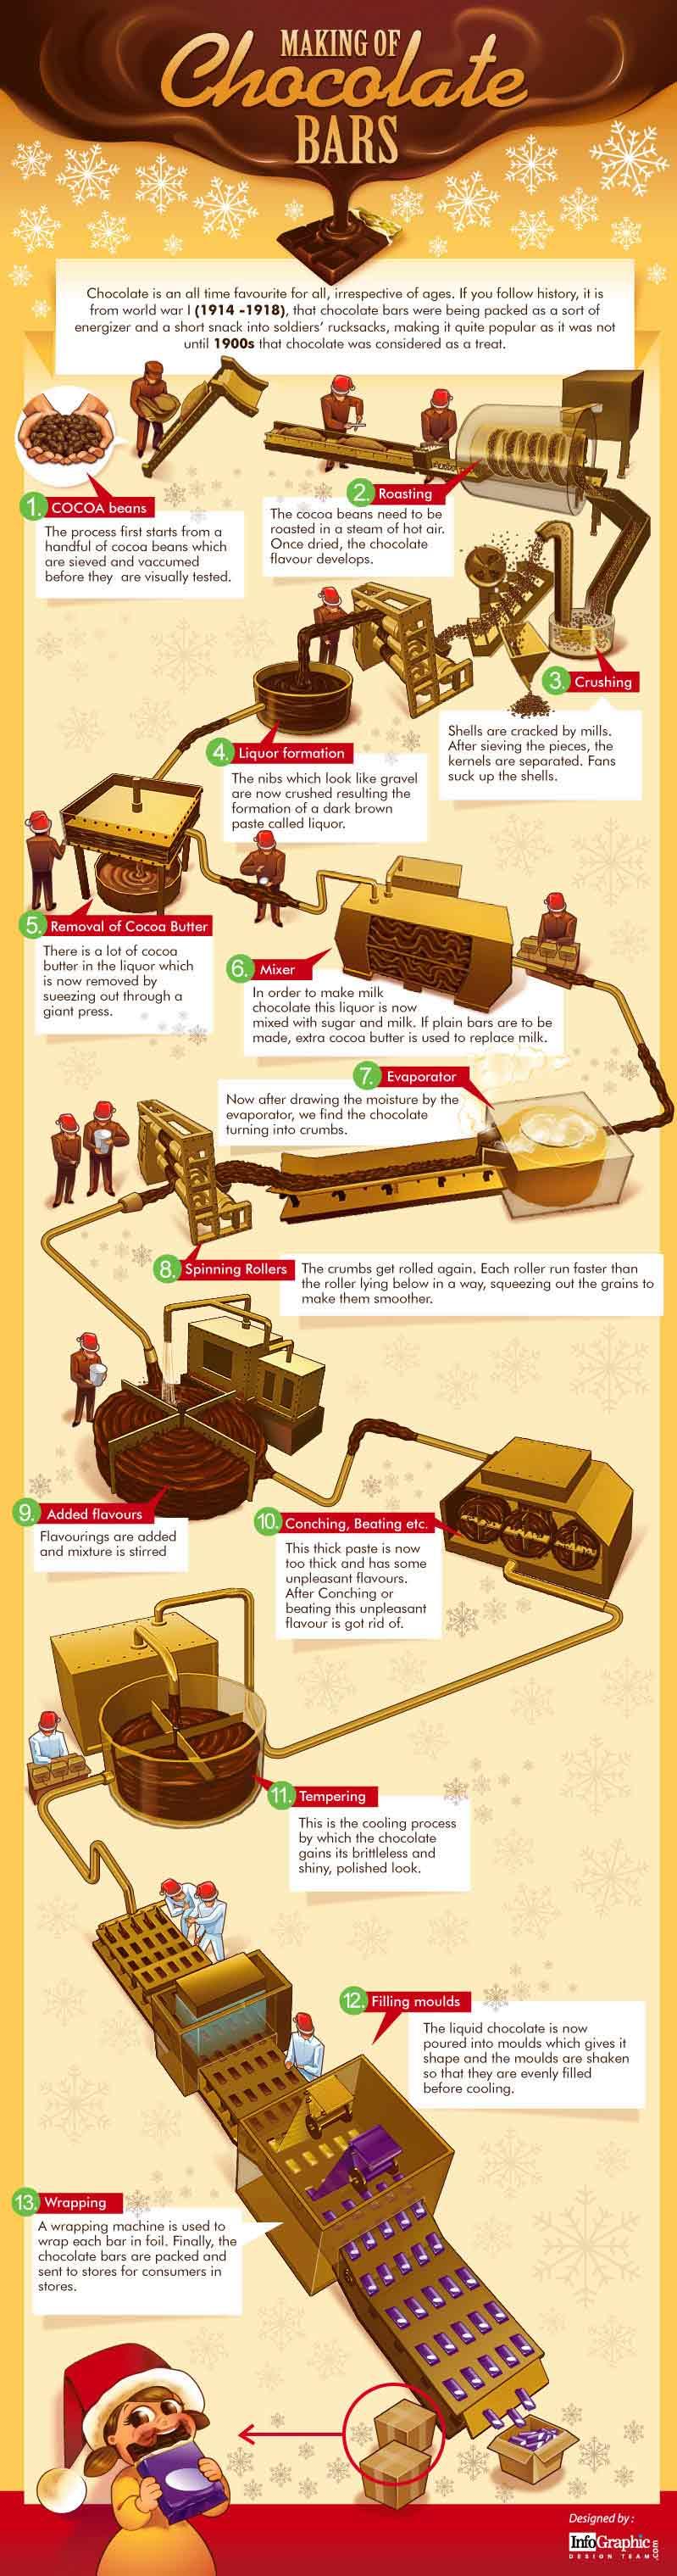 Infographic Chocolade van boon tot reep